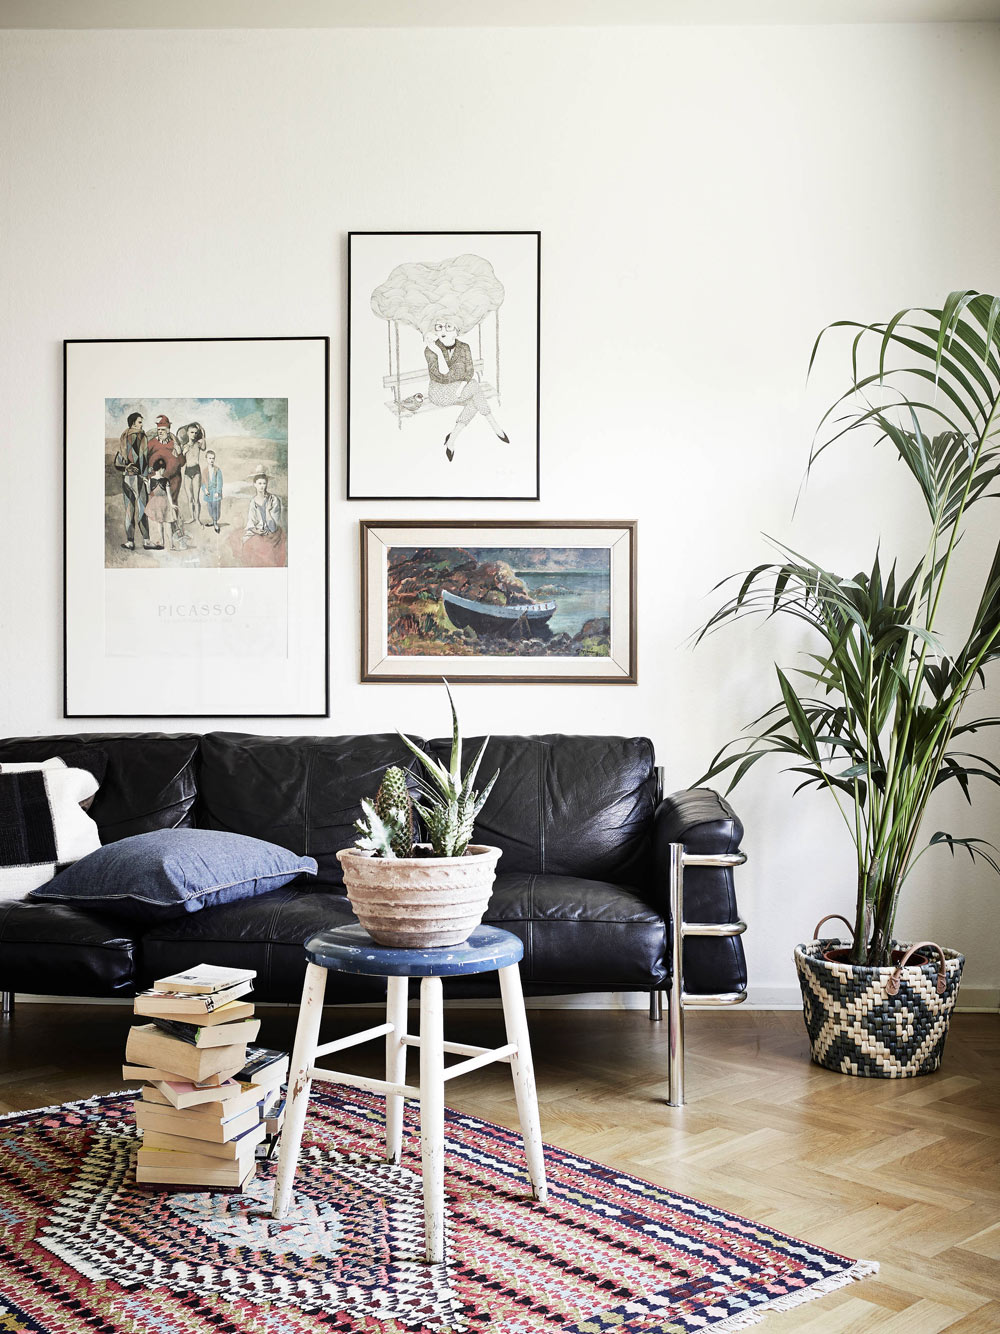 oracle, fox, sunday, sanctuary, danish, home, minimal, house, tour, white, living, room, house, plants